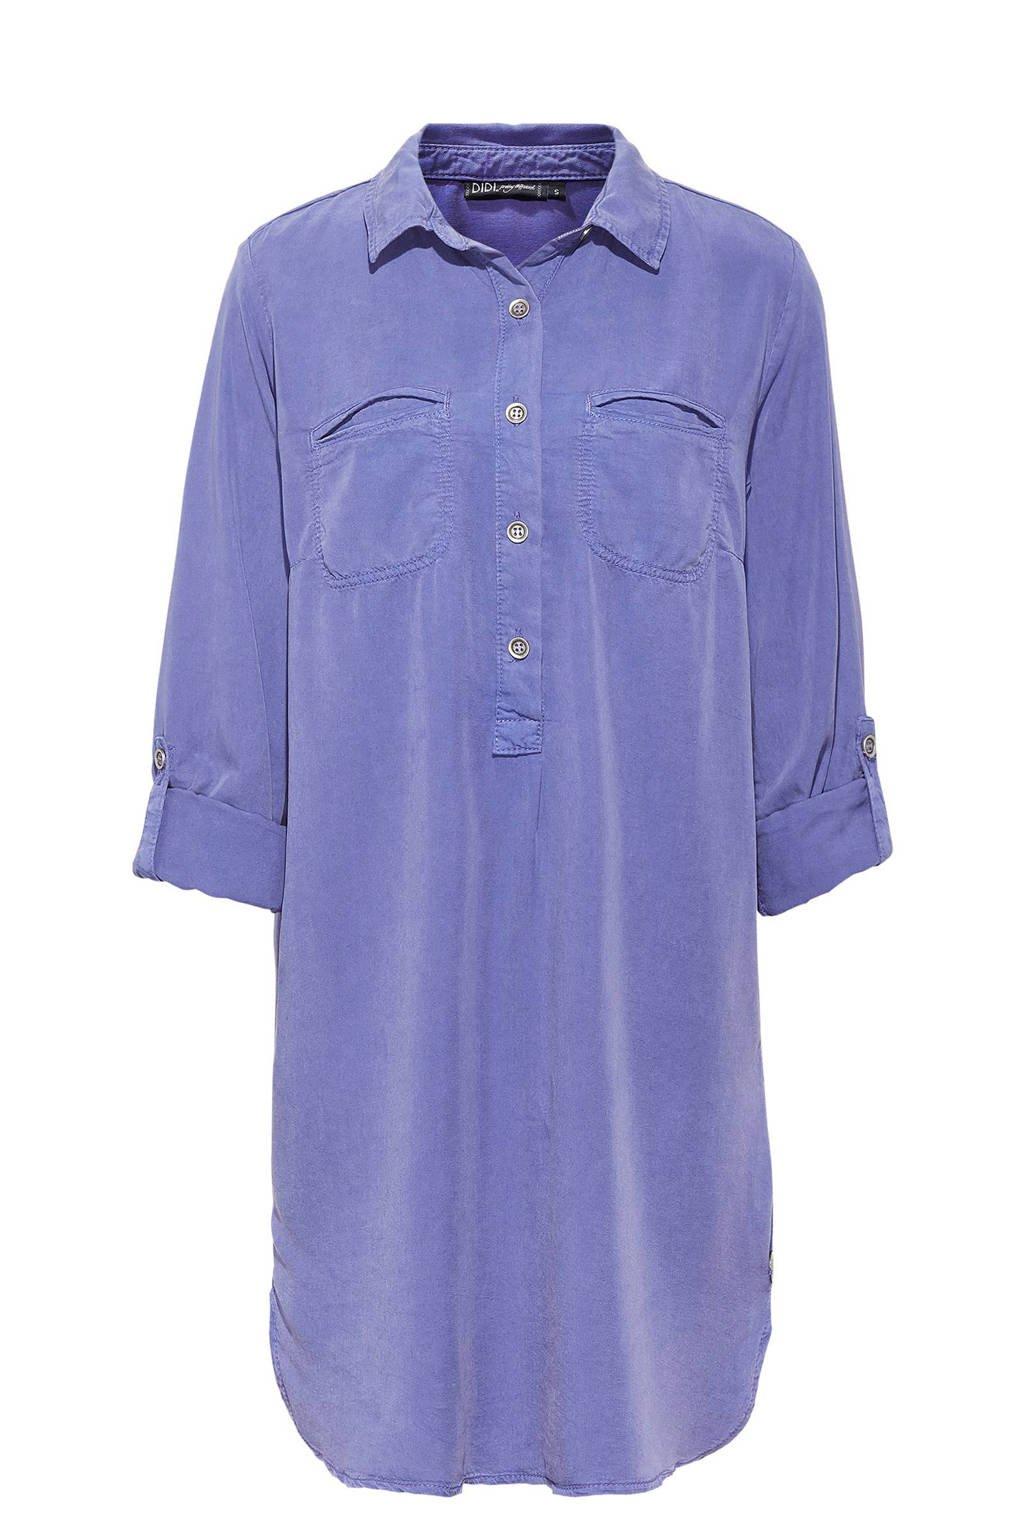 Didi blousejurk, Lavendelblauw